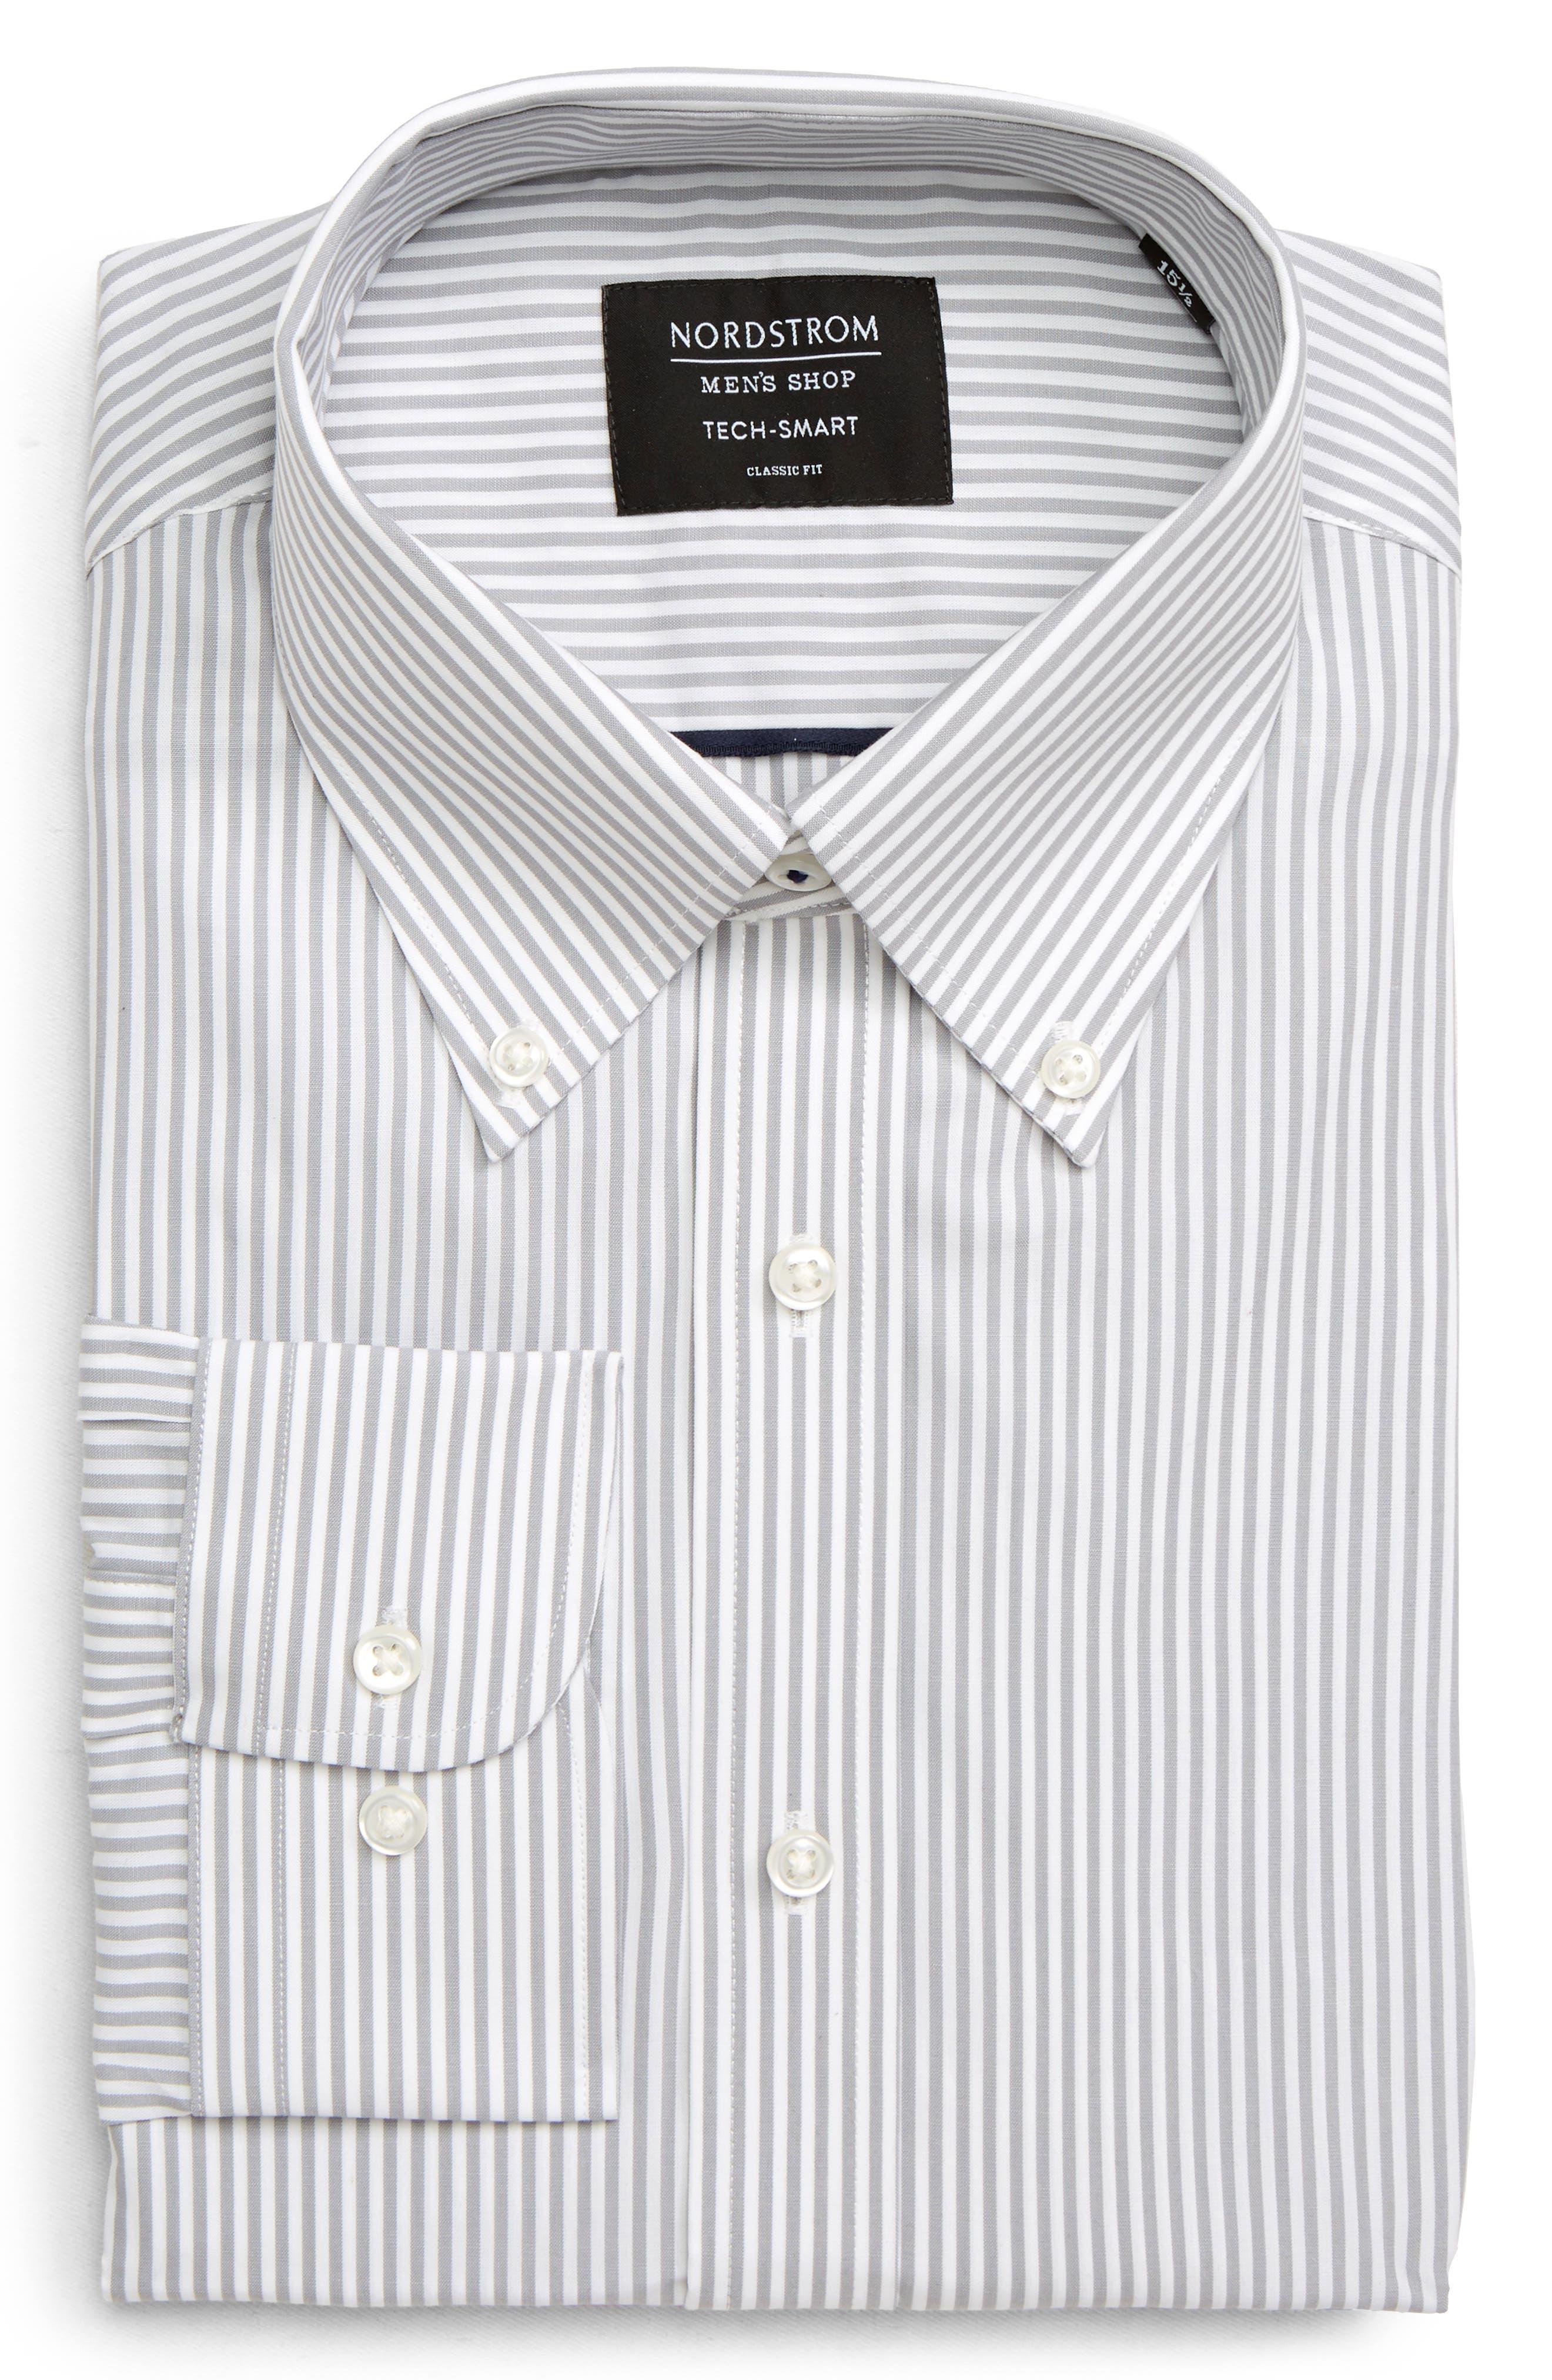 NORDSTROM MEN'S SHOP, Tech-Smart Classic Fit Stretch Stripe Dress Shirt, Main thumbnail 1, color, GREY SLEET